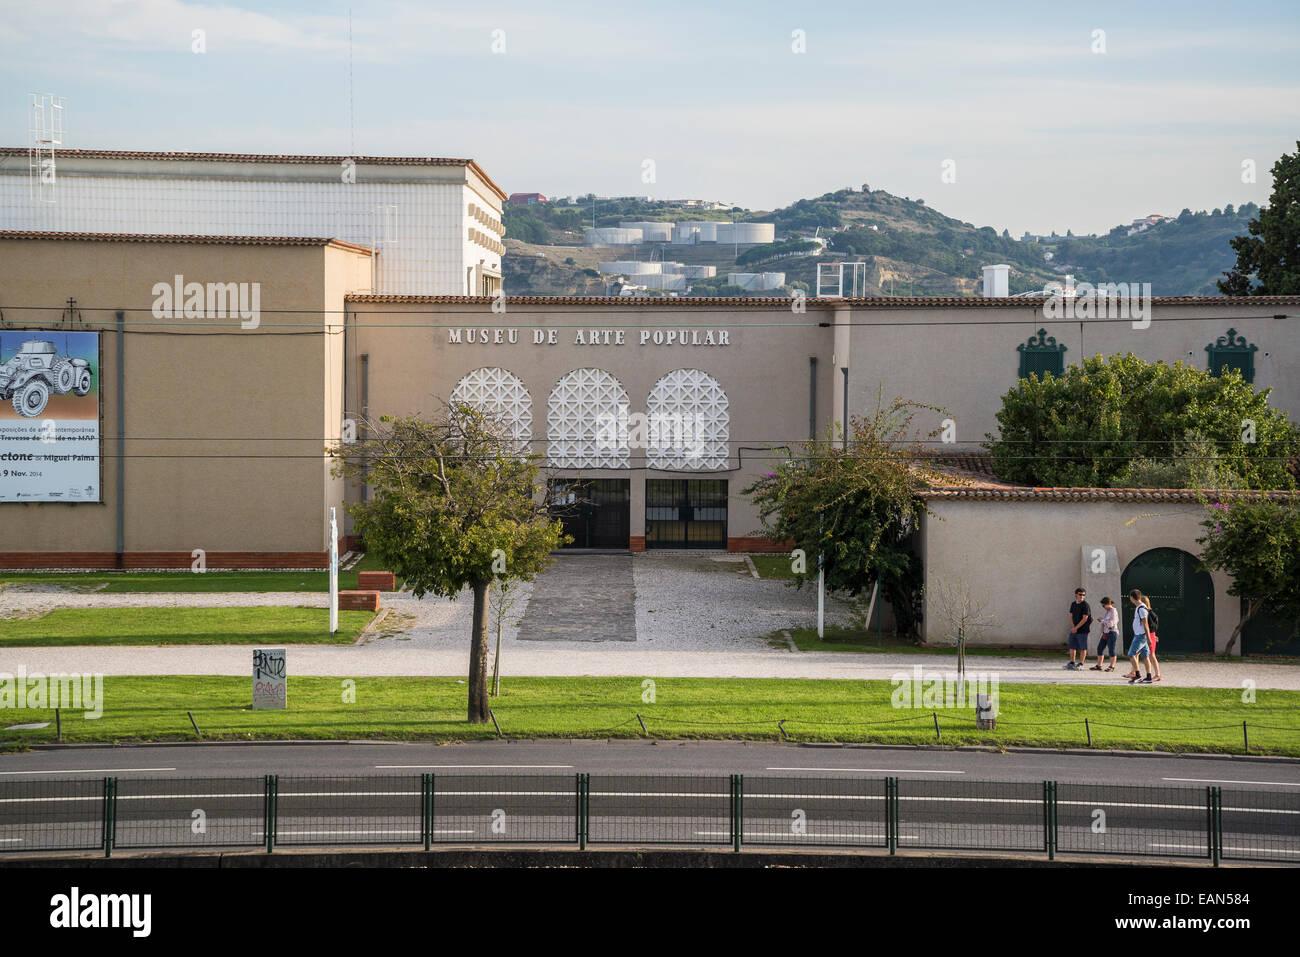 Folk Art Museum, Museu de Arte Popular, Belem district, Lisbon, Portugal - Stock Image